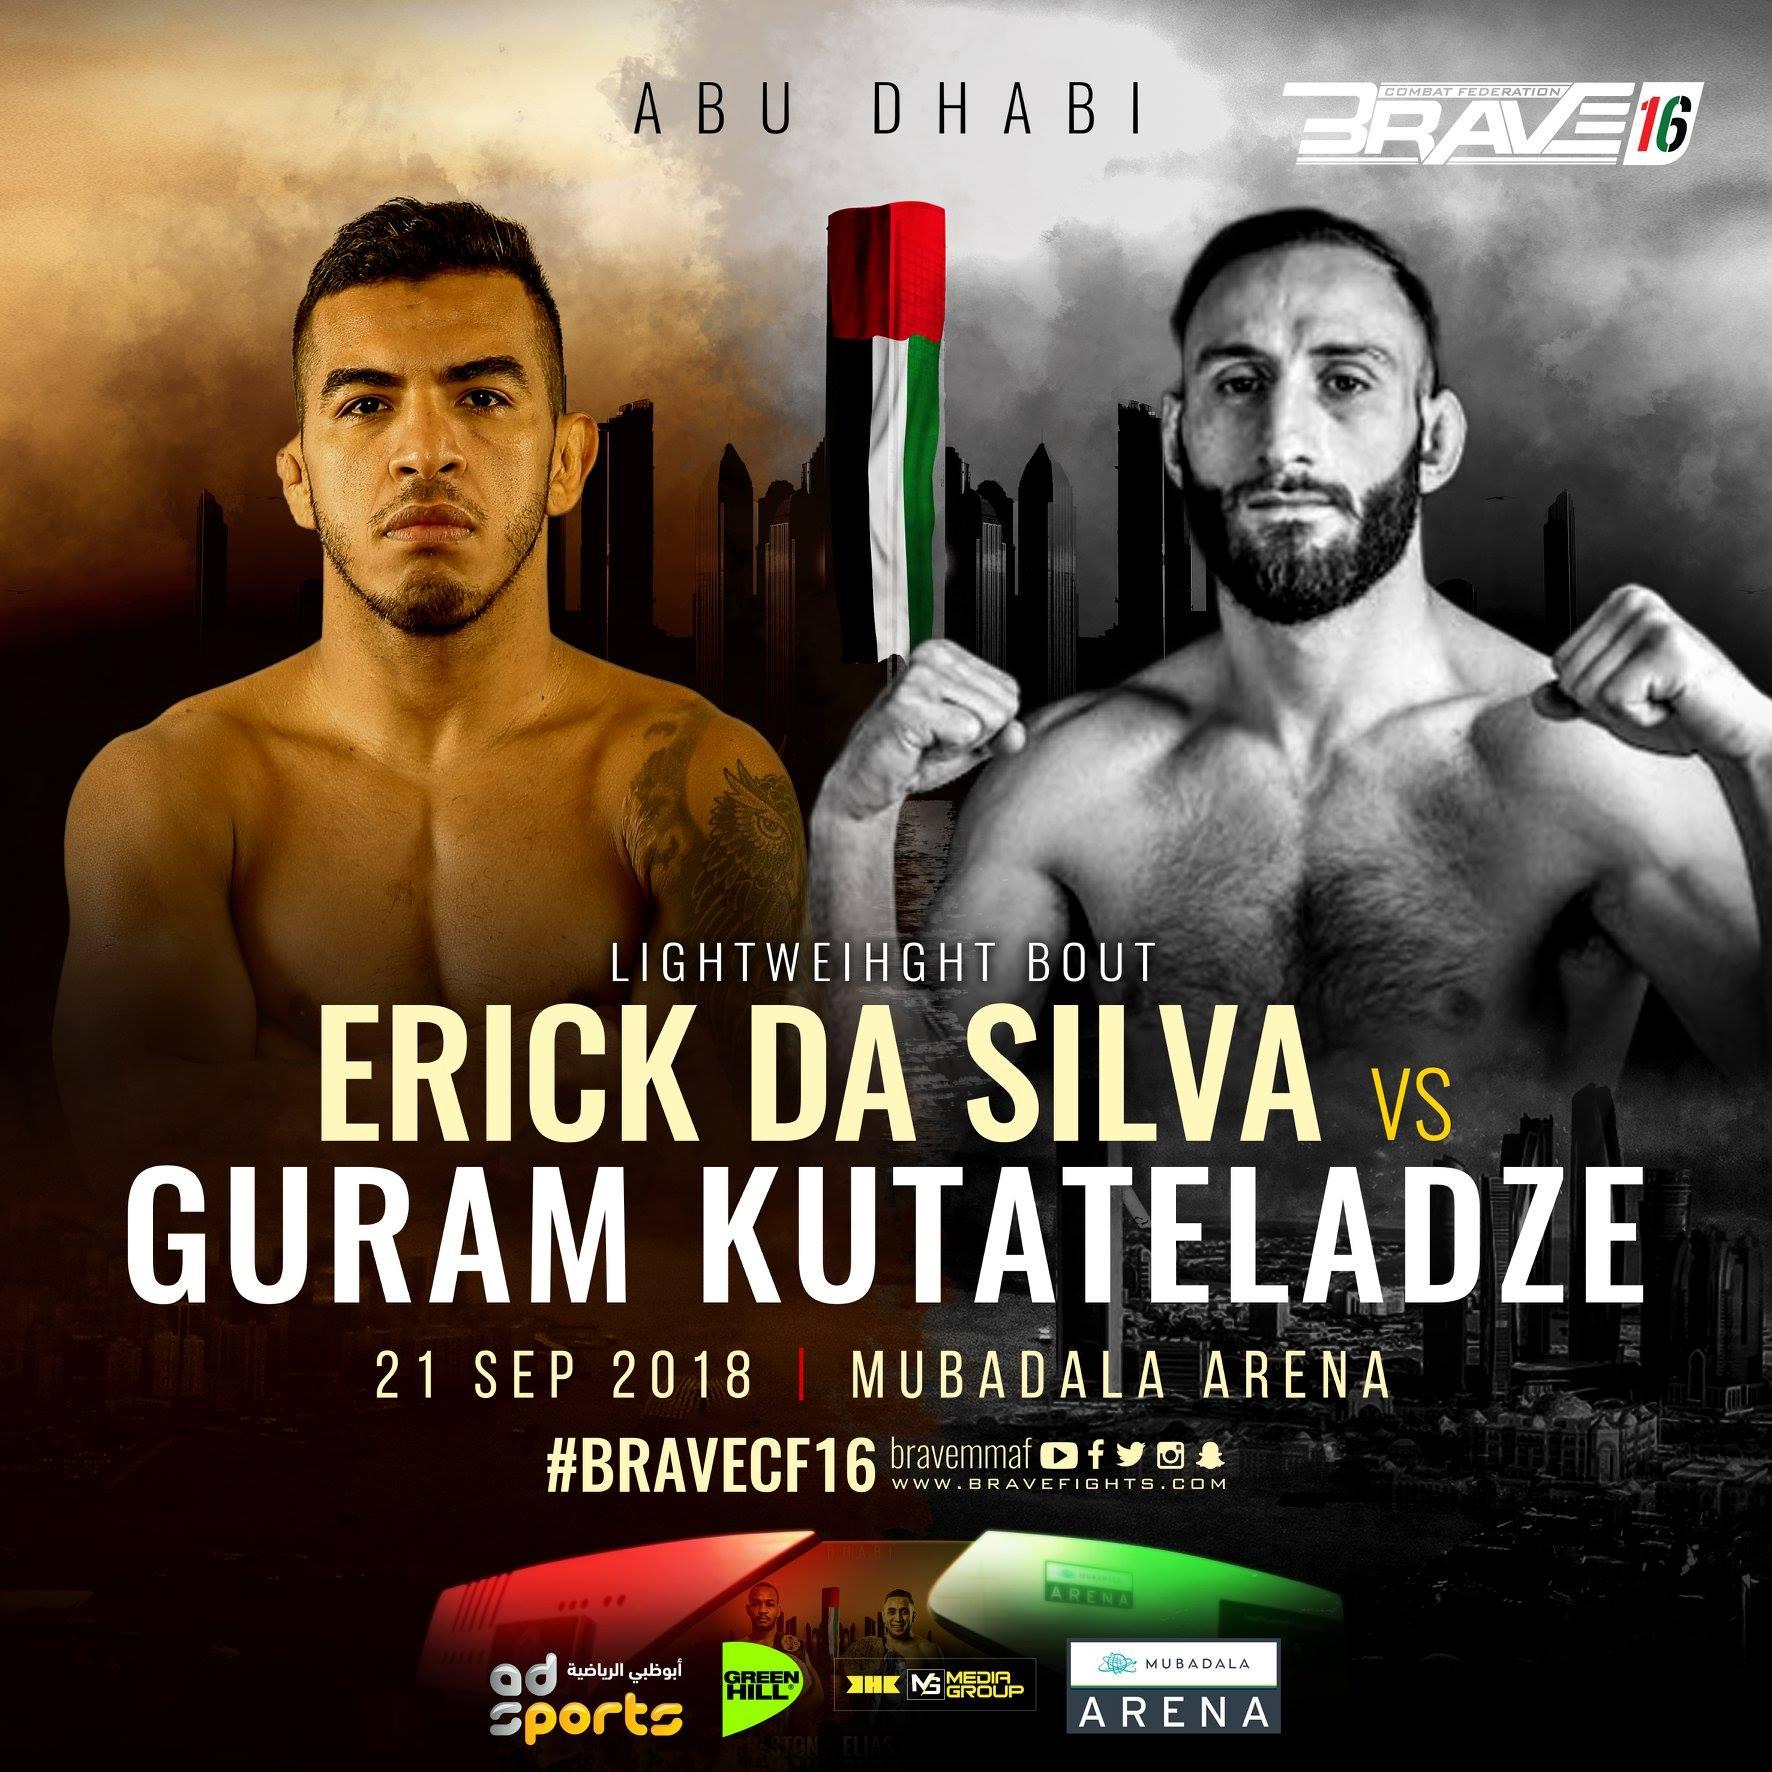 Erick da Silva to face Guram Kutateladze at Brave 16 - Brave 16